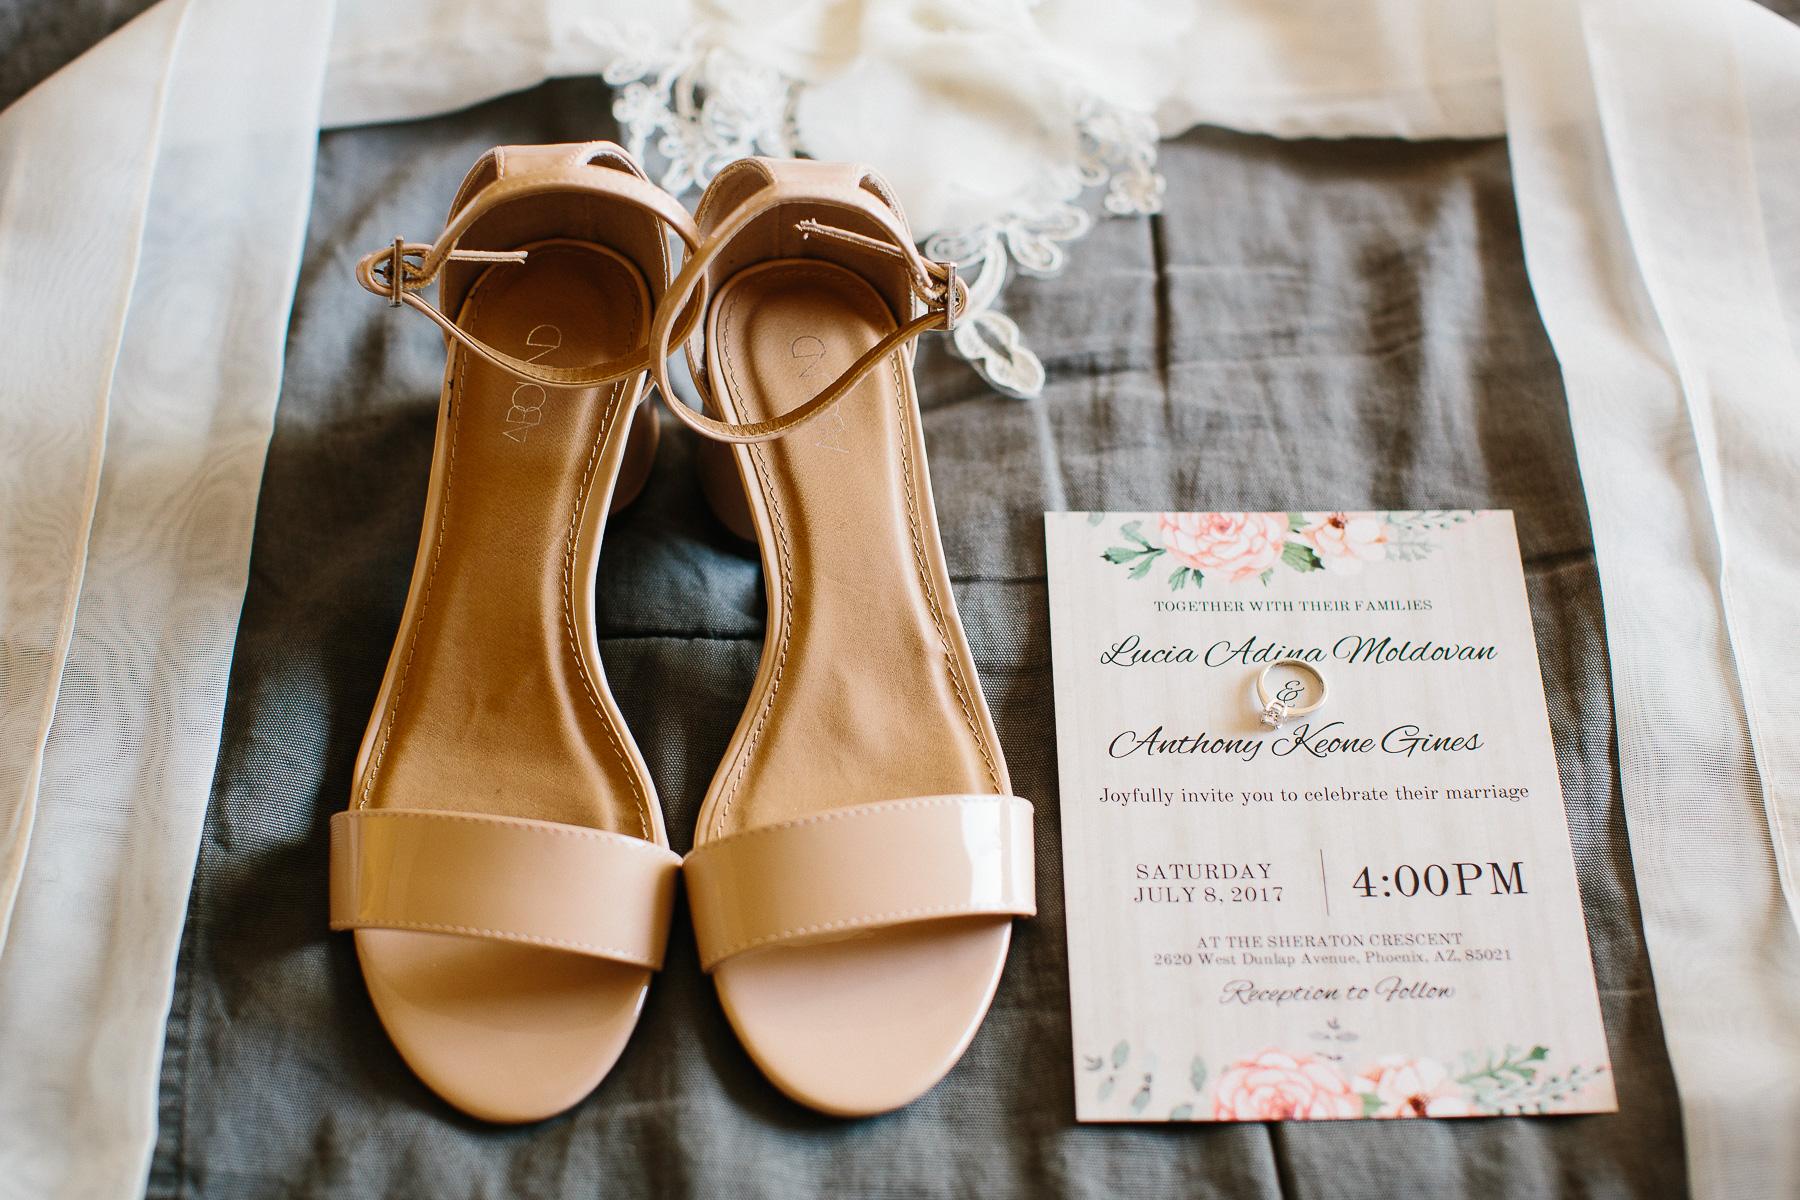 170708-Luxium-Weddings-Arizona-Sheraton-Phoenix-Arizona-Photographer-Hilton-Hawaiian-1000.jpg